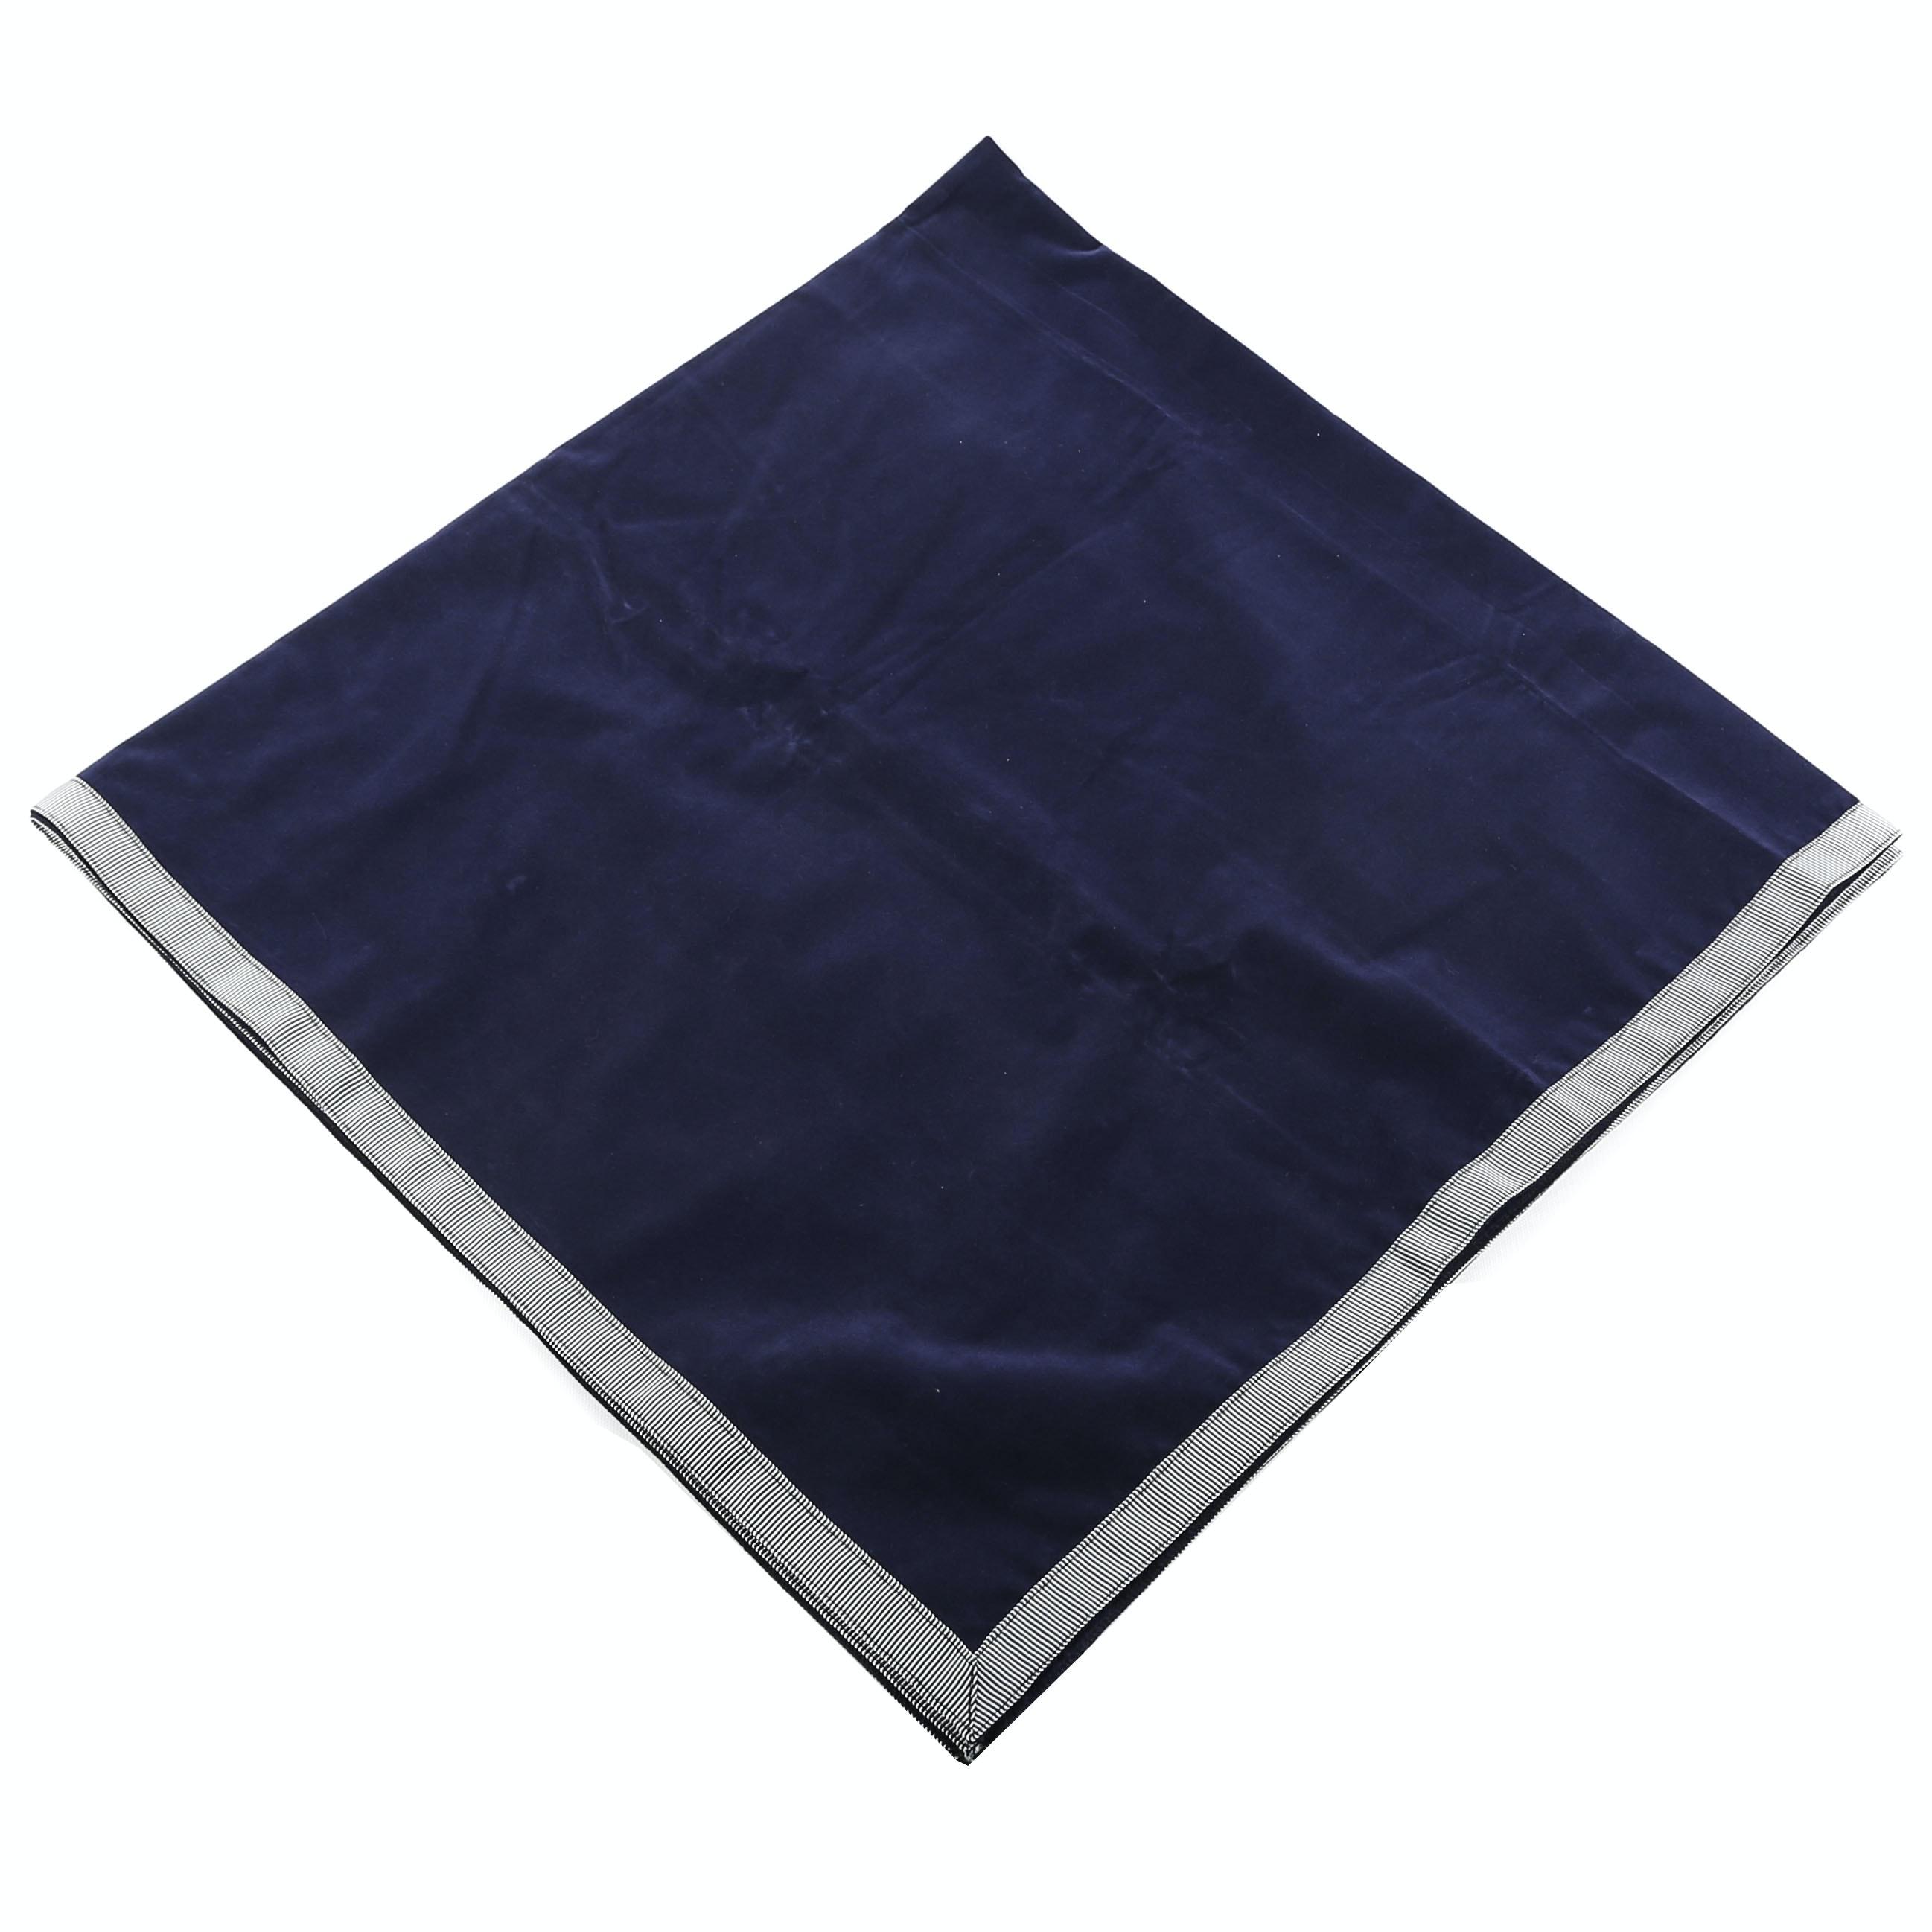 Matouk Card Table Cover